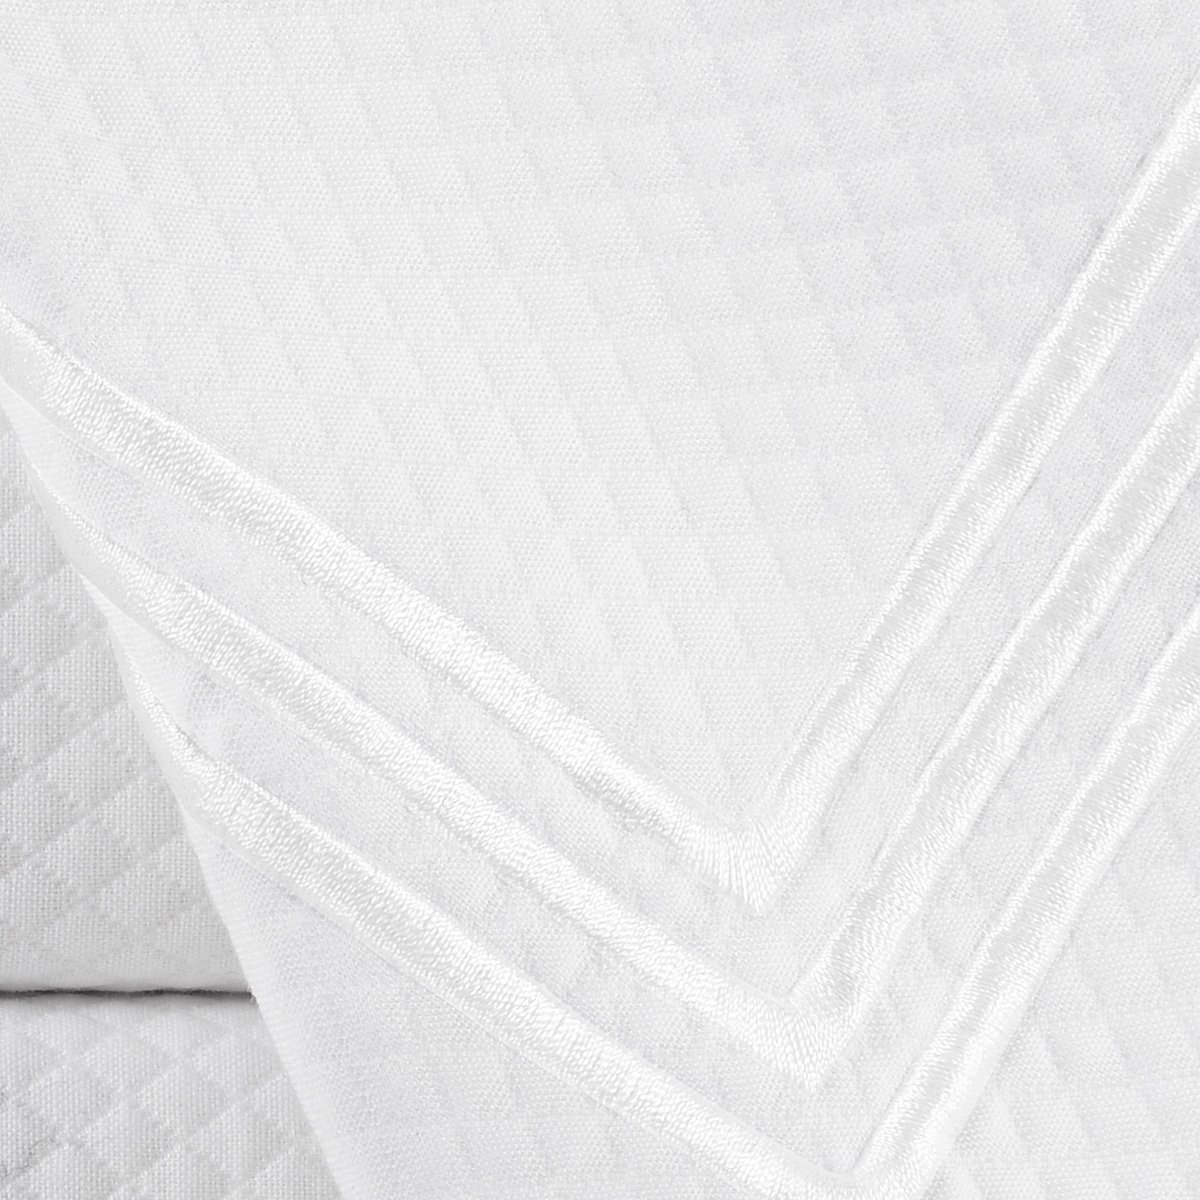 Echelon Home Echelon Hotel Collection Three Line Shower Curtain, Light Grey by Echelon Home (Image #4)